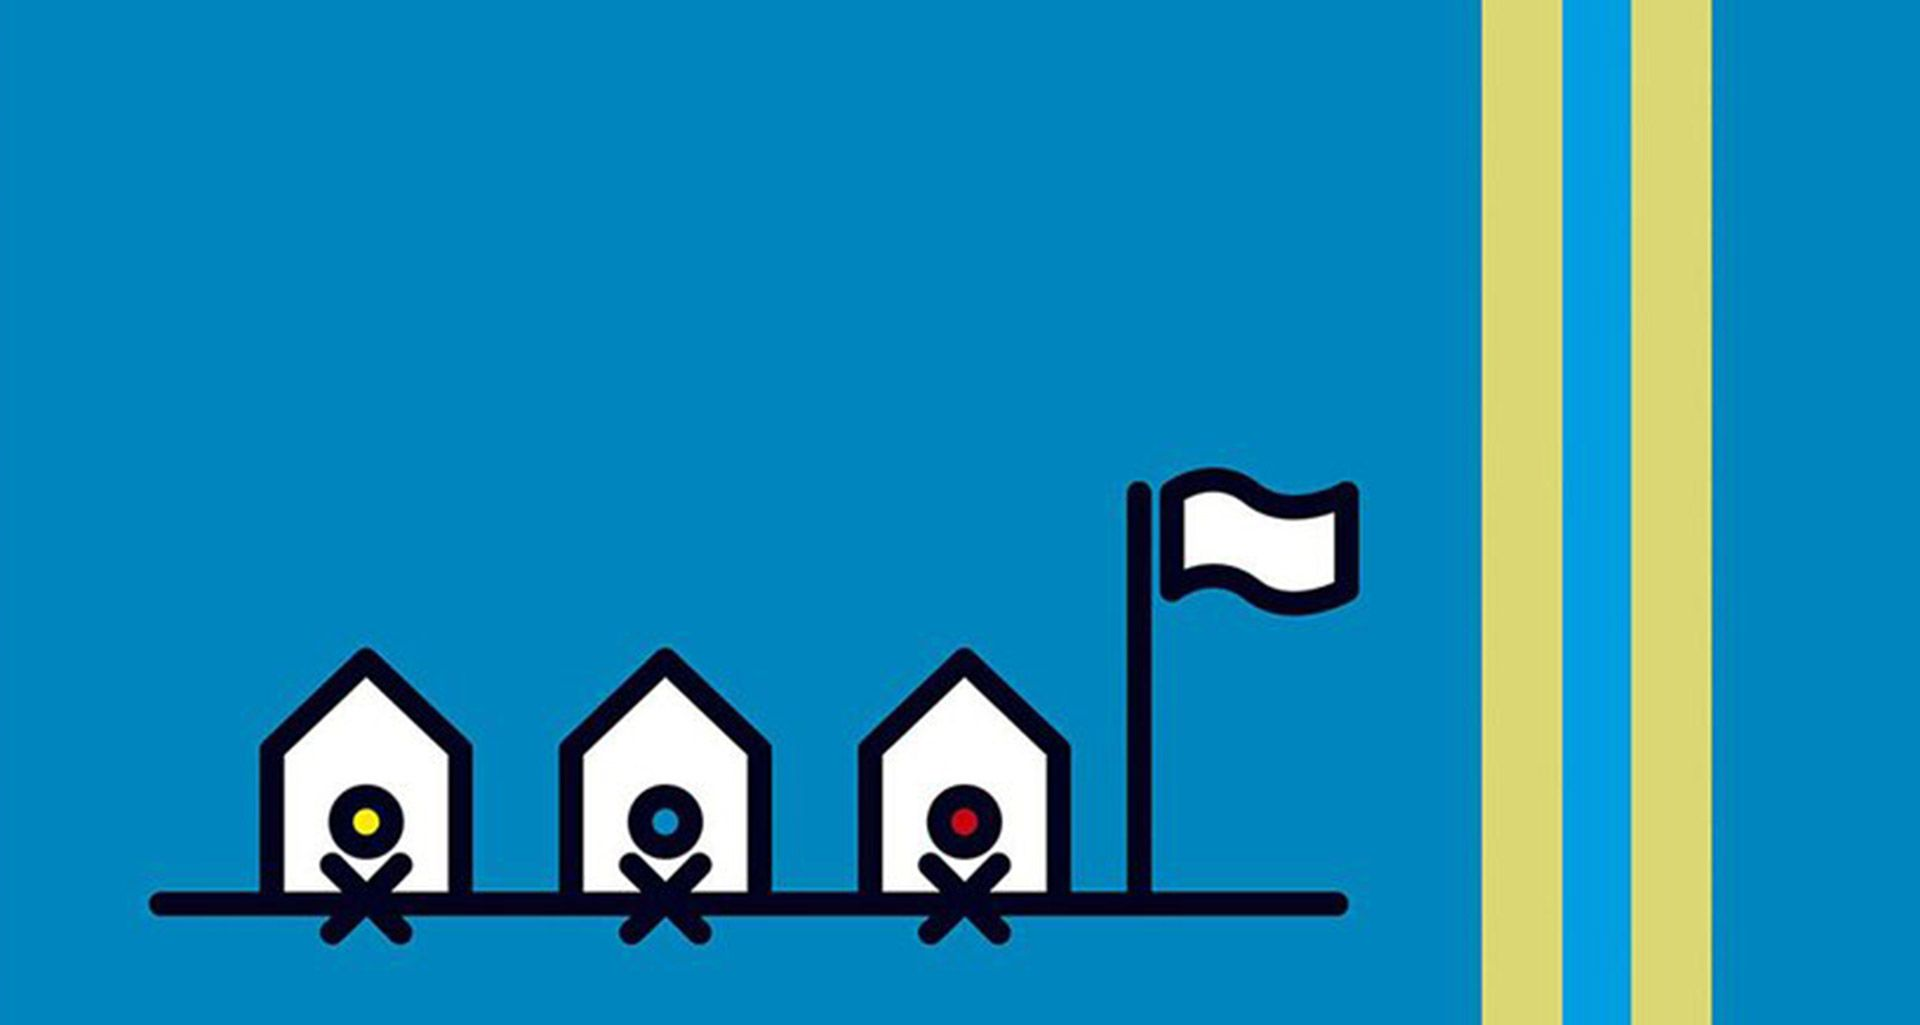 tiny bauhaus planungshilfe flüchtlingsbauten